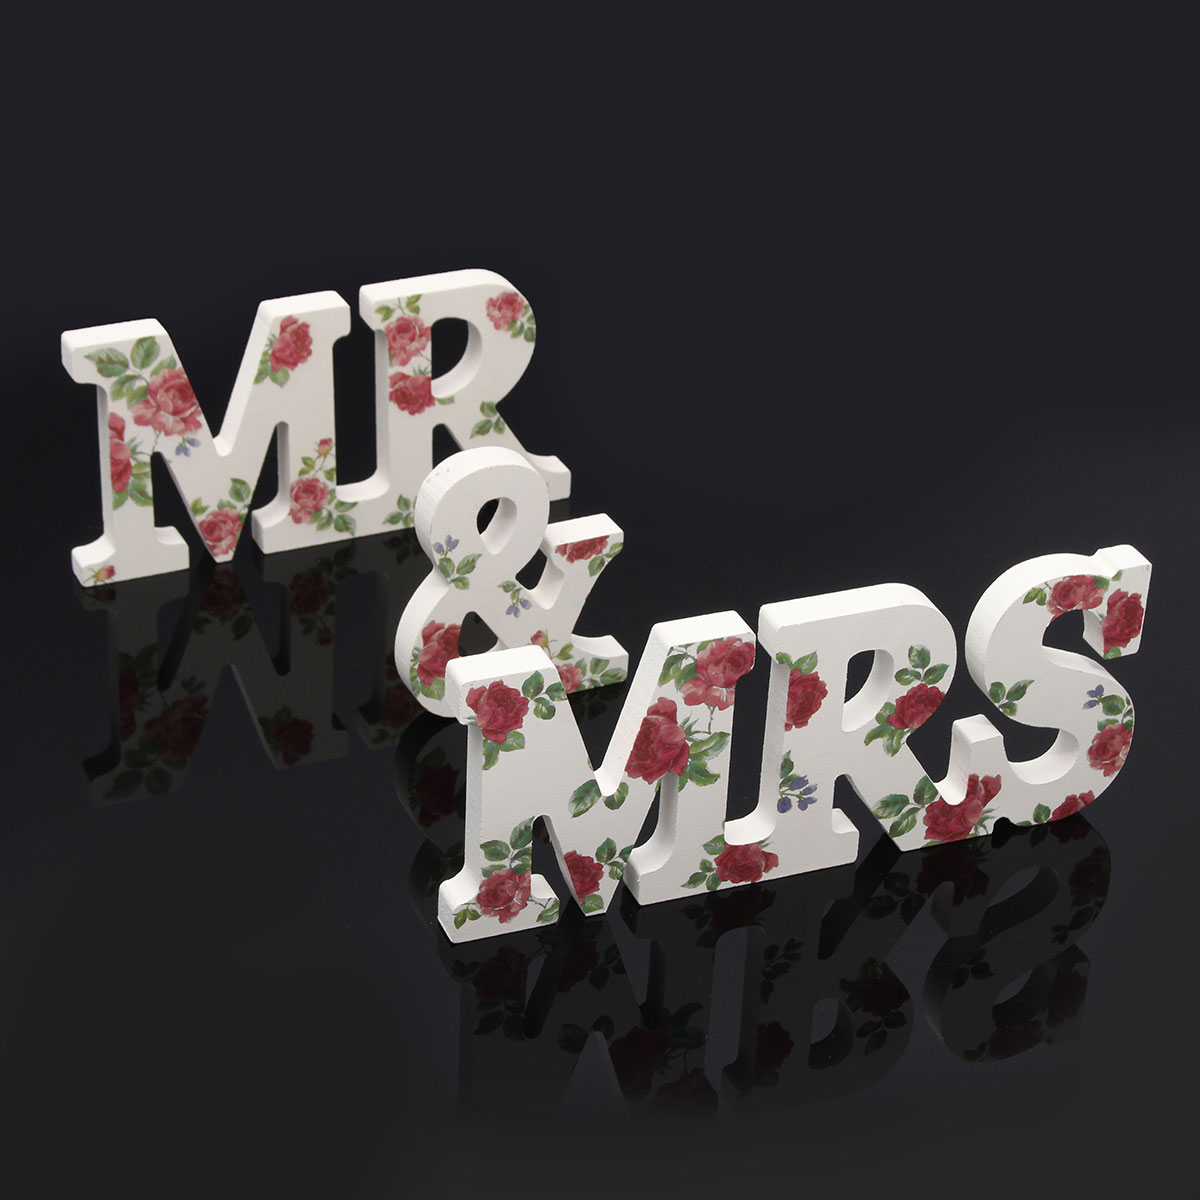 Flower Mr Mrs Letters Wedding Decoration Imitation Wooden Letters Wedding <font><b>Party</b></font> <font><b>Top</b></font> Table Sign Home <font><b>Garden</b></font> Events Supplies